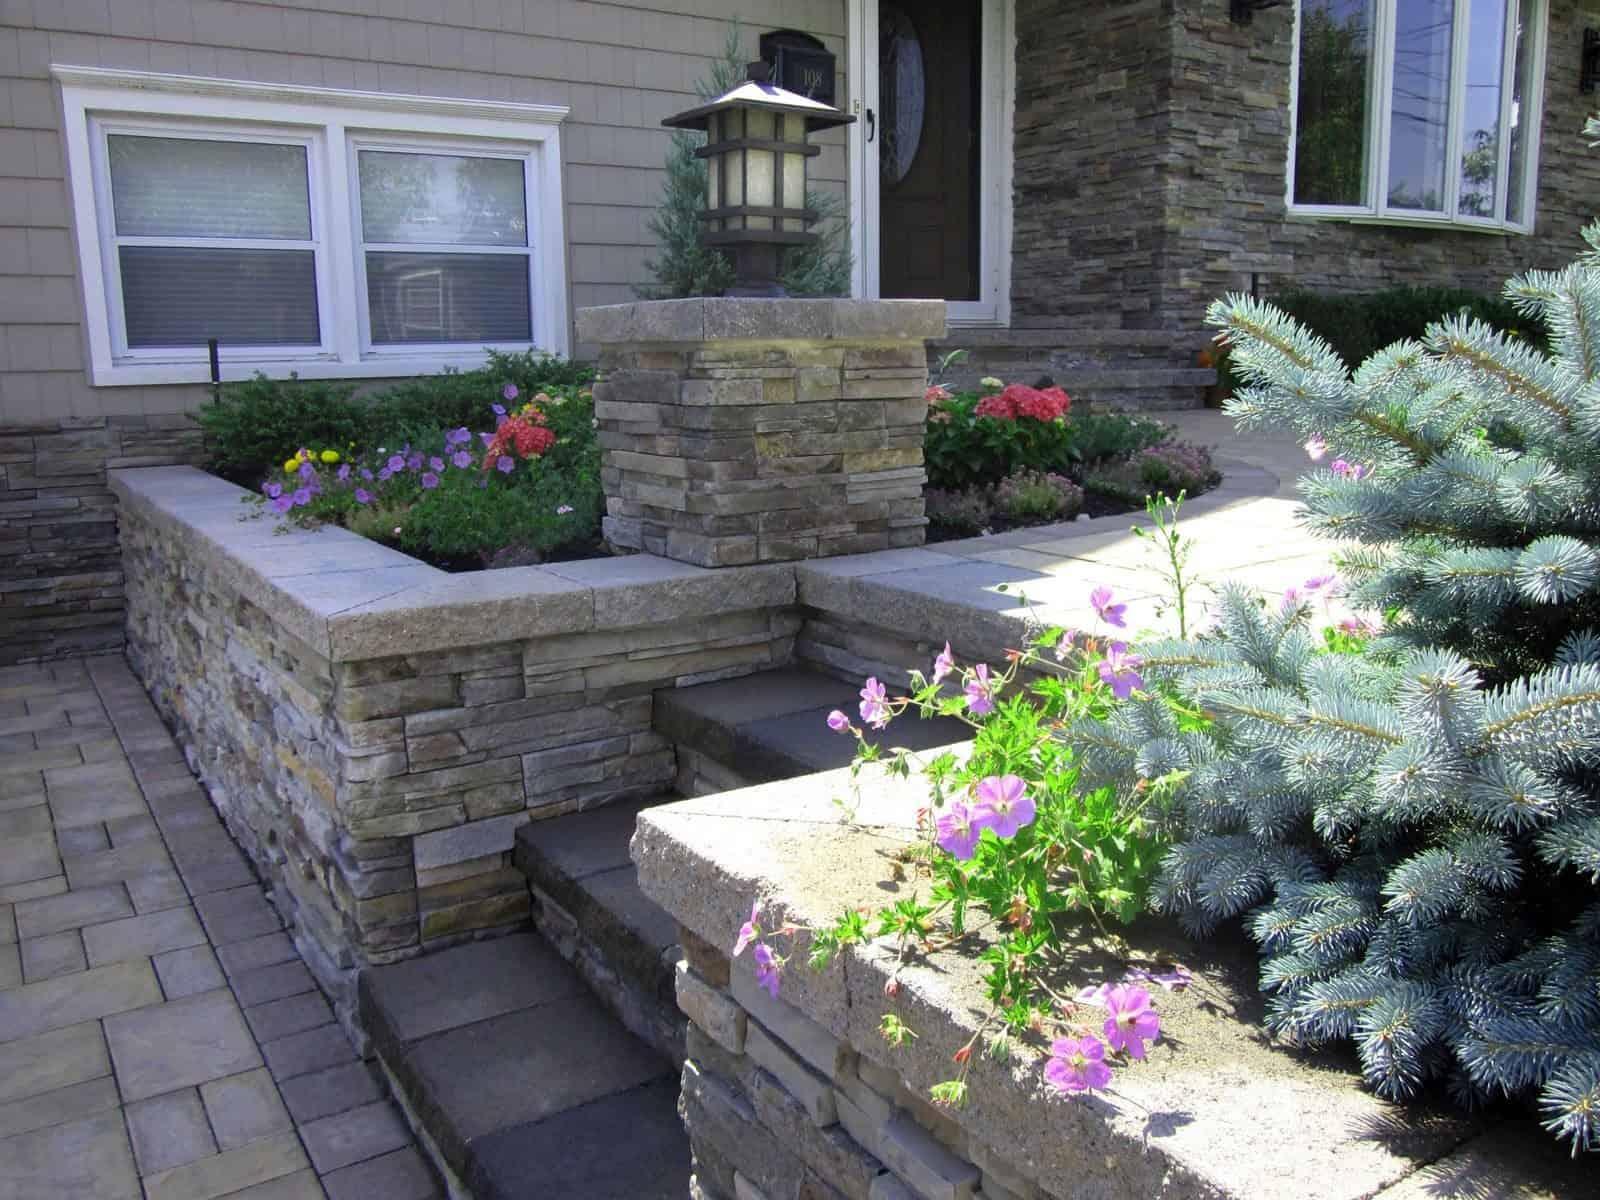 Landscape Plantings - Geranium Rozanne and Montgomery Blue Spruce - Massapequa, Long Island NY